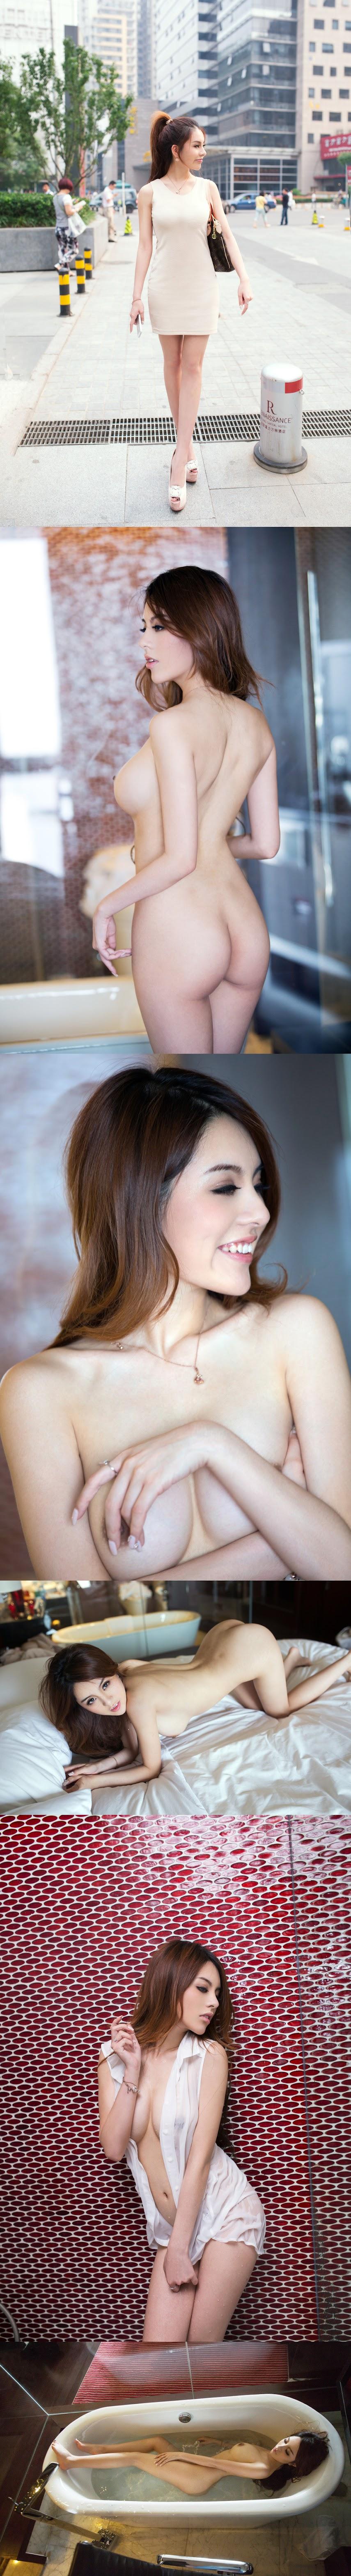 TuiGirl 13 赵惟依 - idols